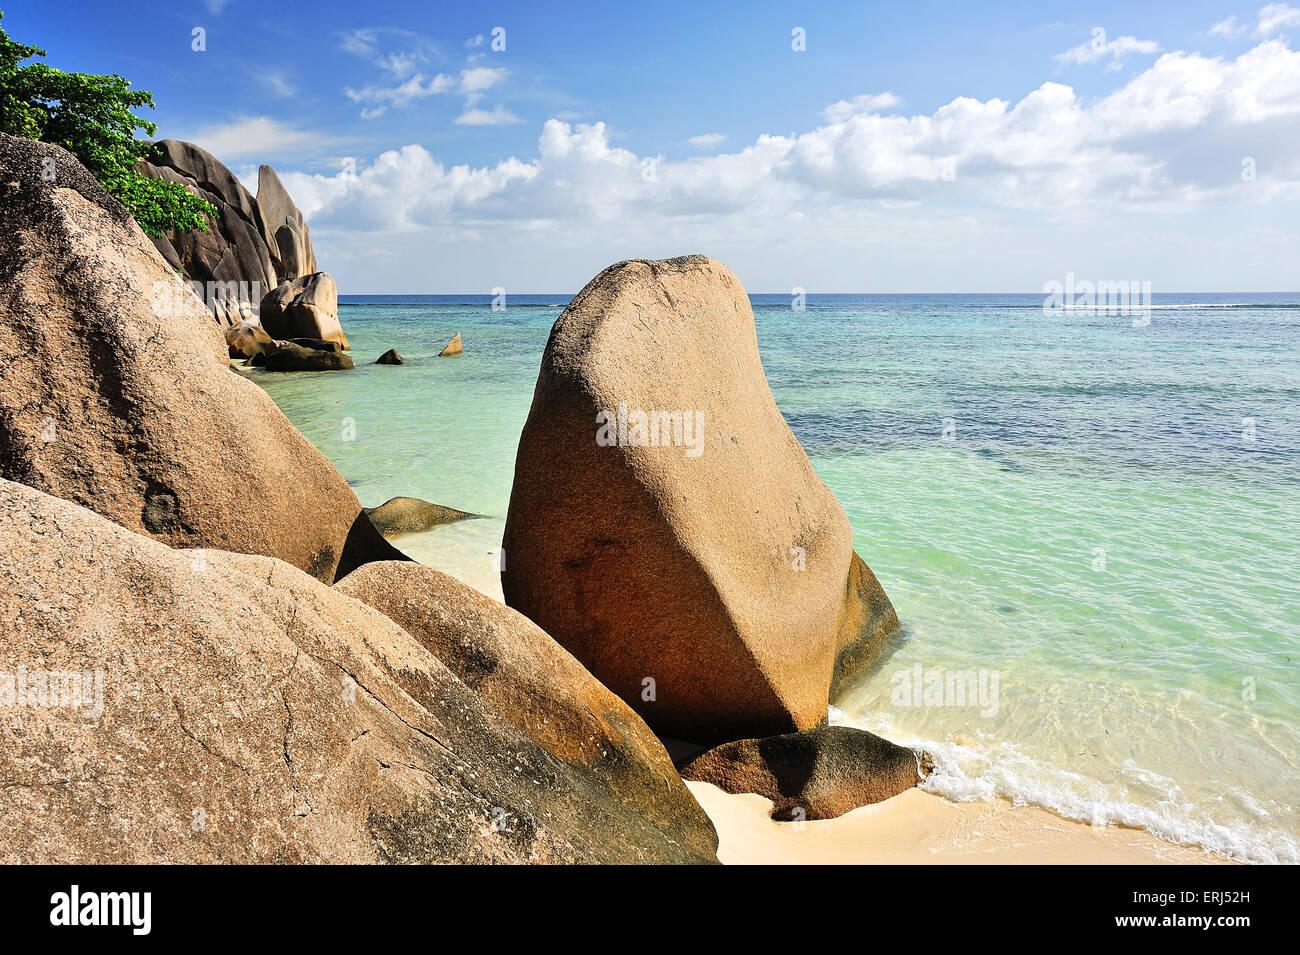 Sea View Source d' Argent,  Beach on Island La Digue, Seychelles - Stock Image